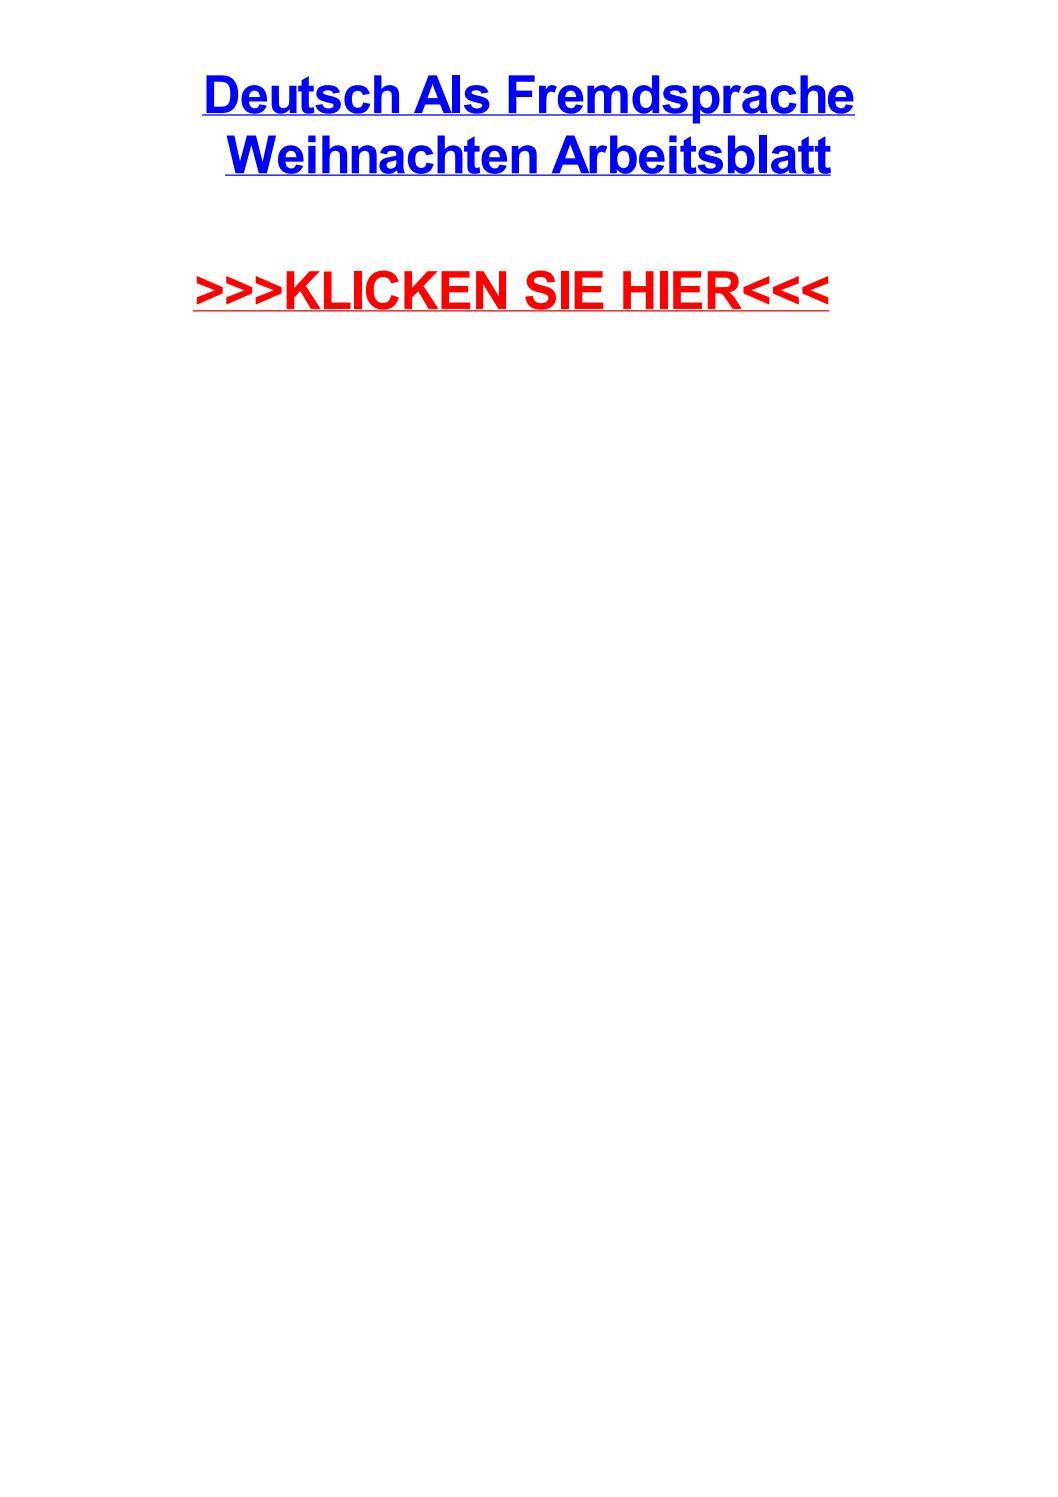 Schön Lohn Arbeitsblatt Vorlage Fotos - Mathe Arbeitsblatt ...